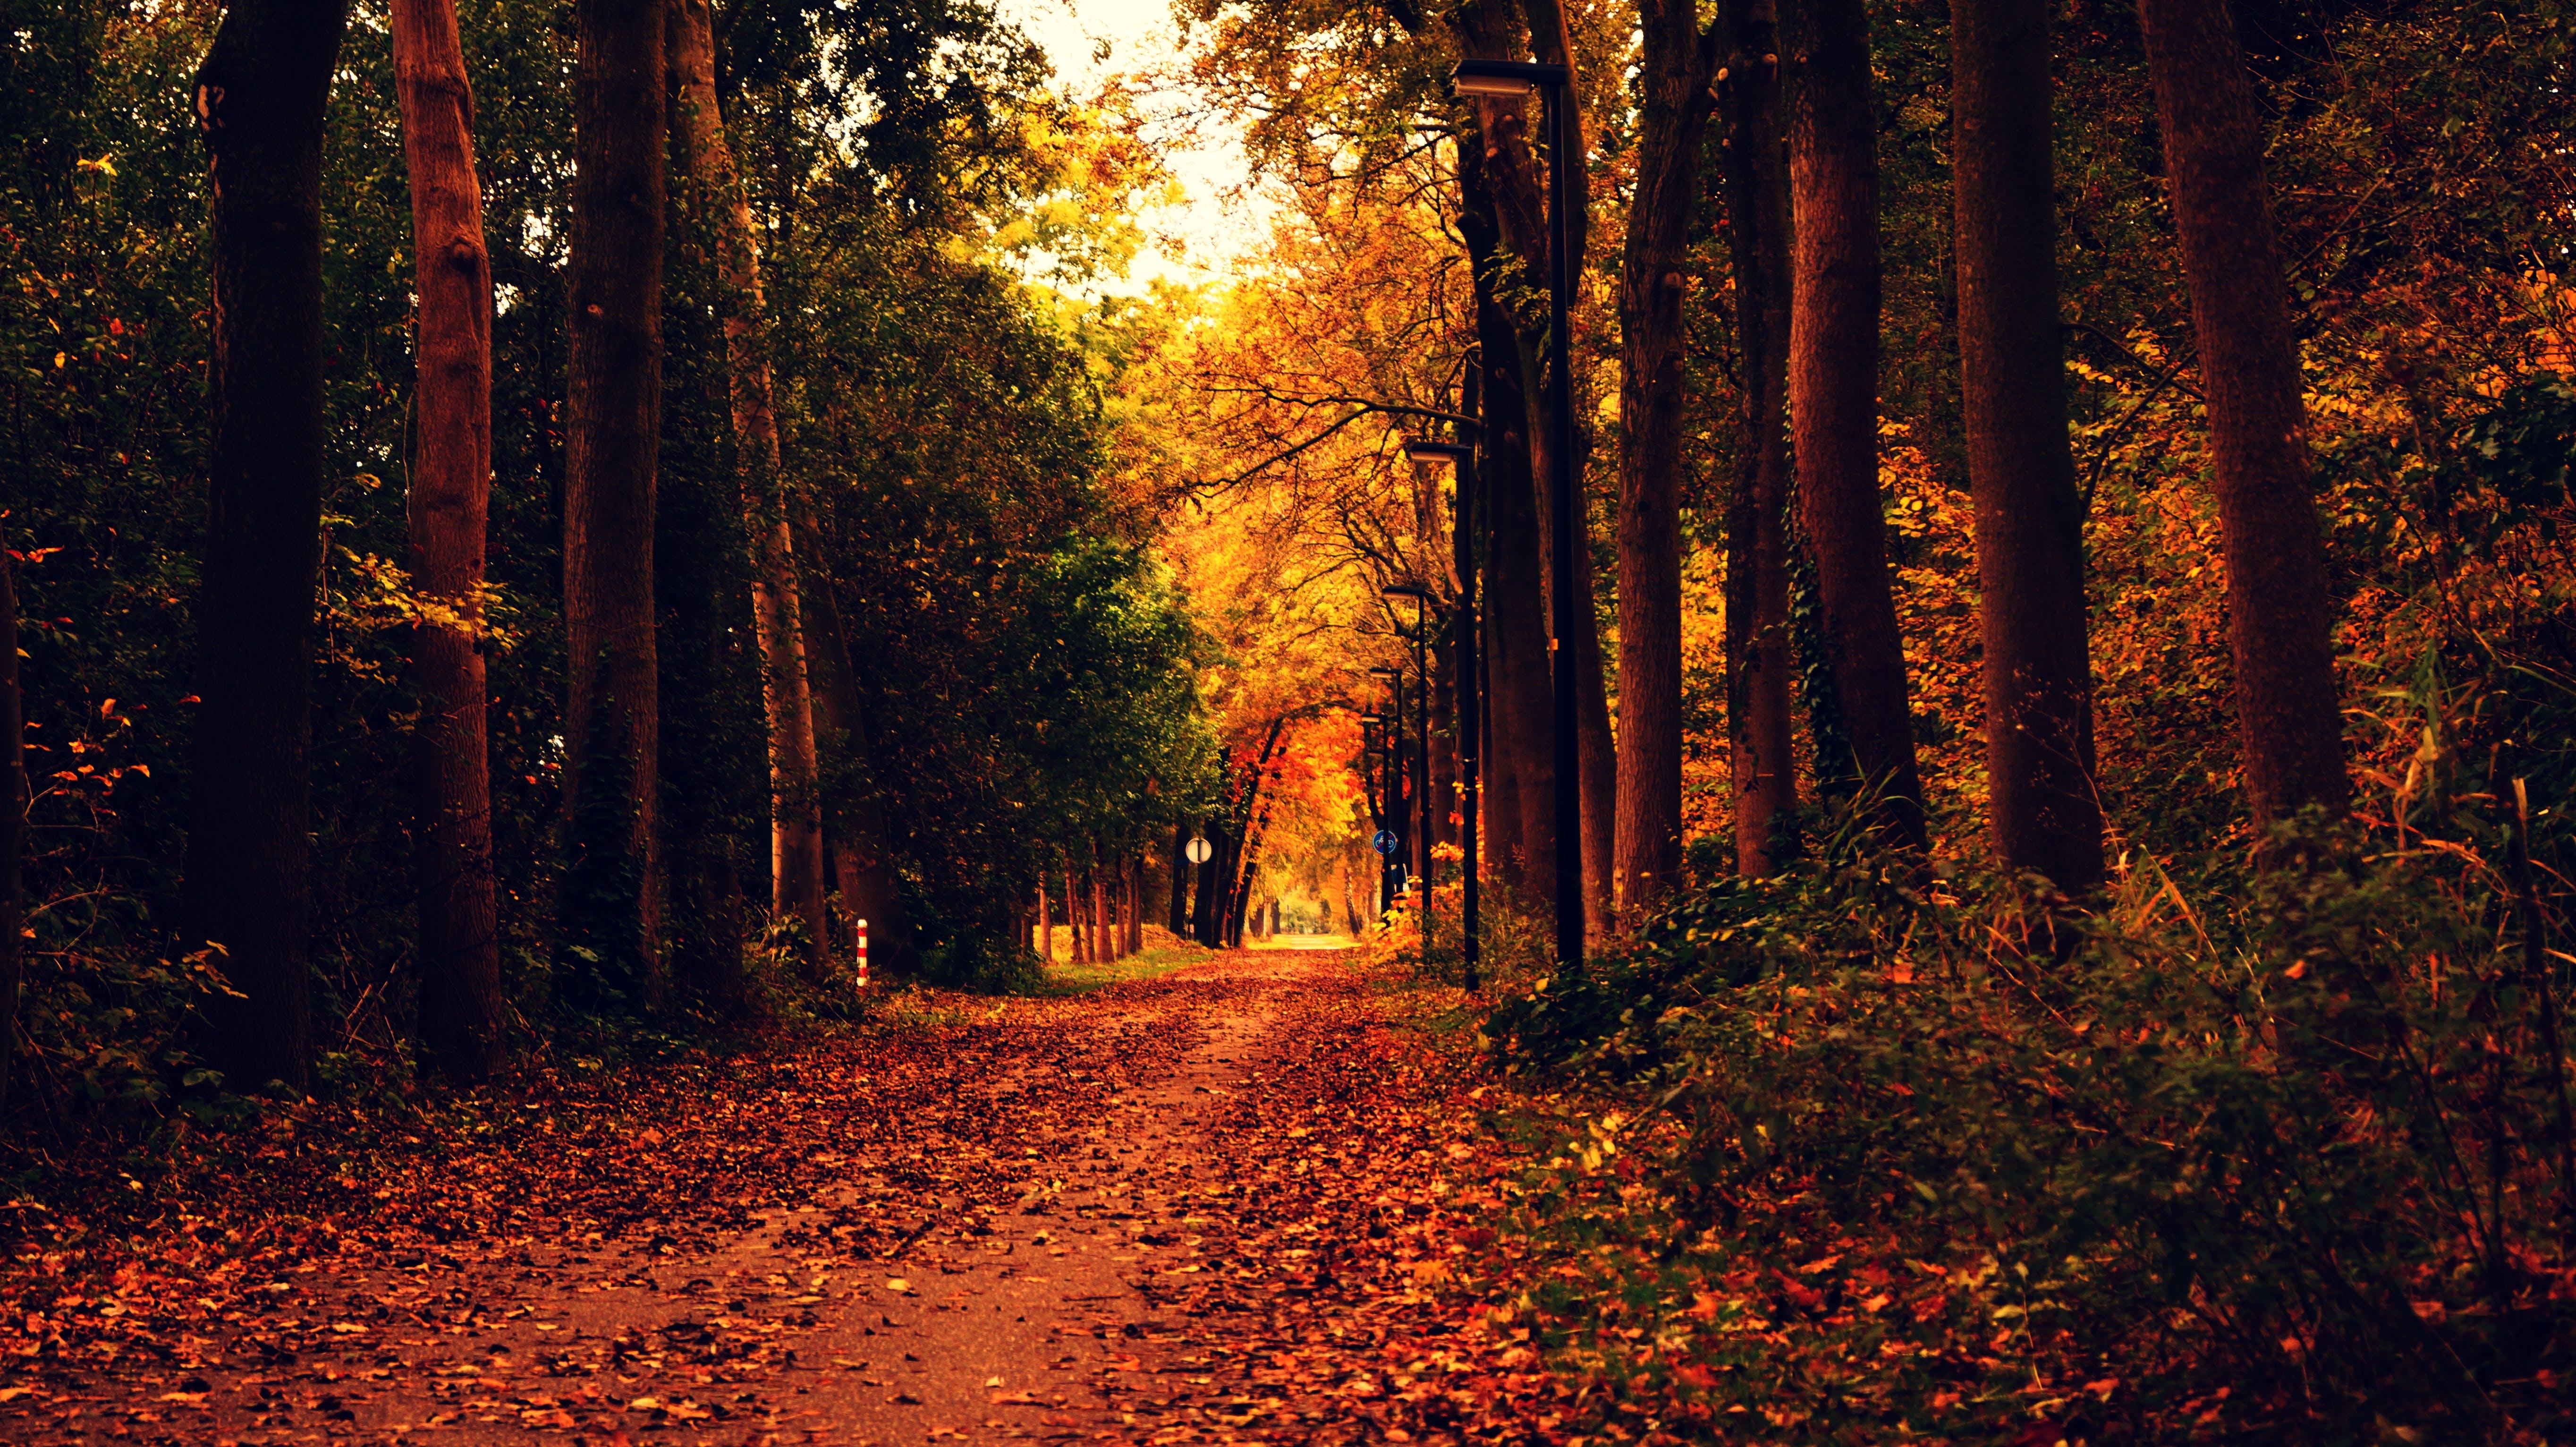 autumn, autumn leaves, dried leaves